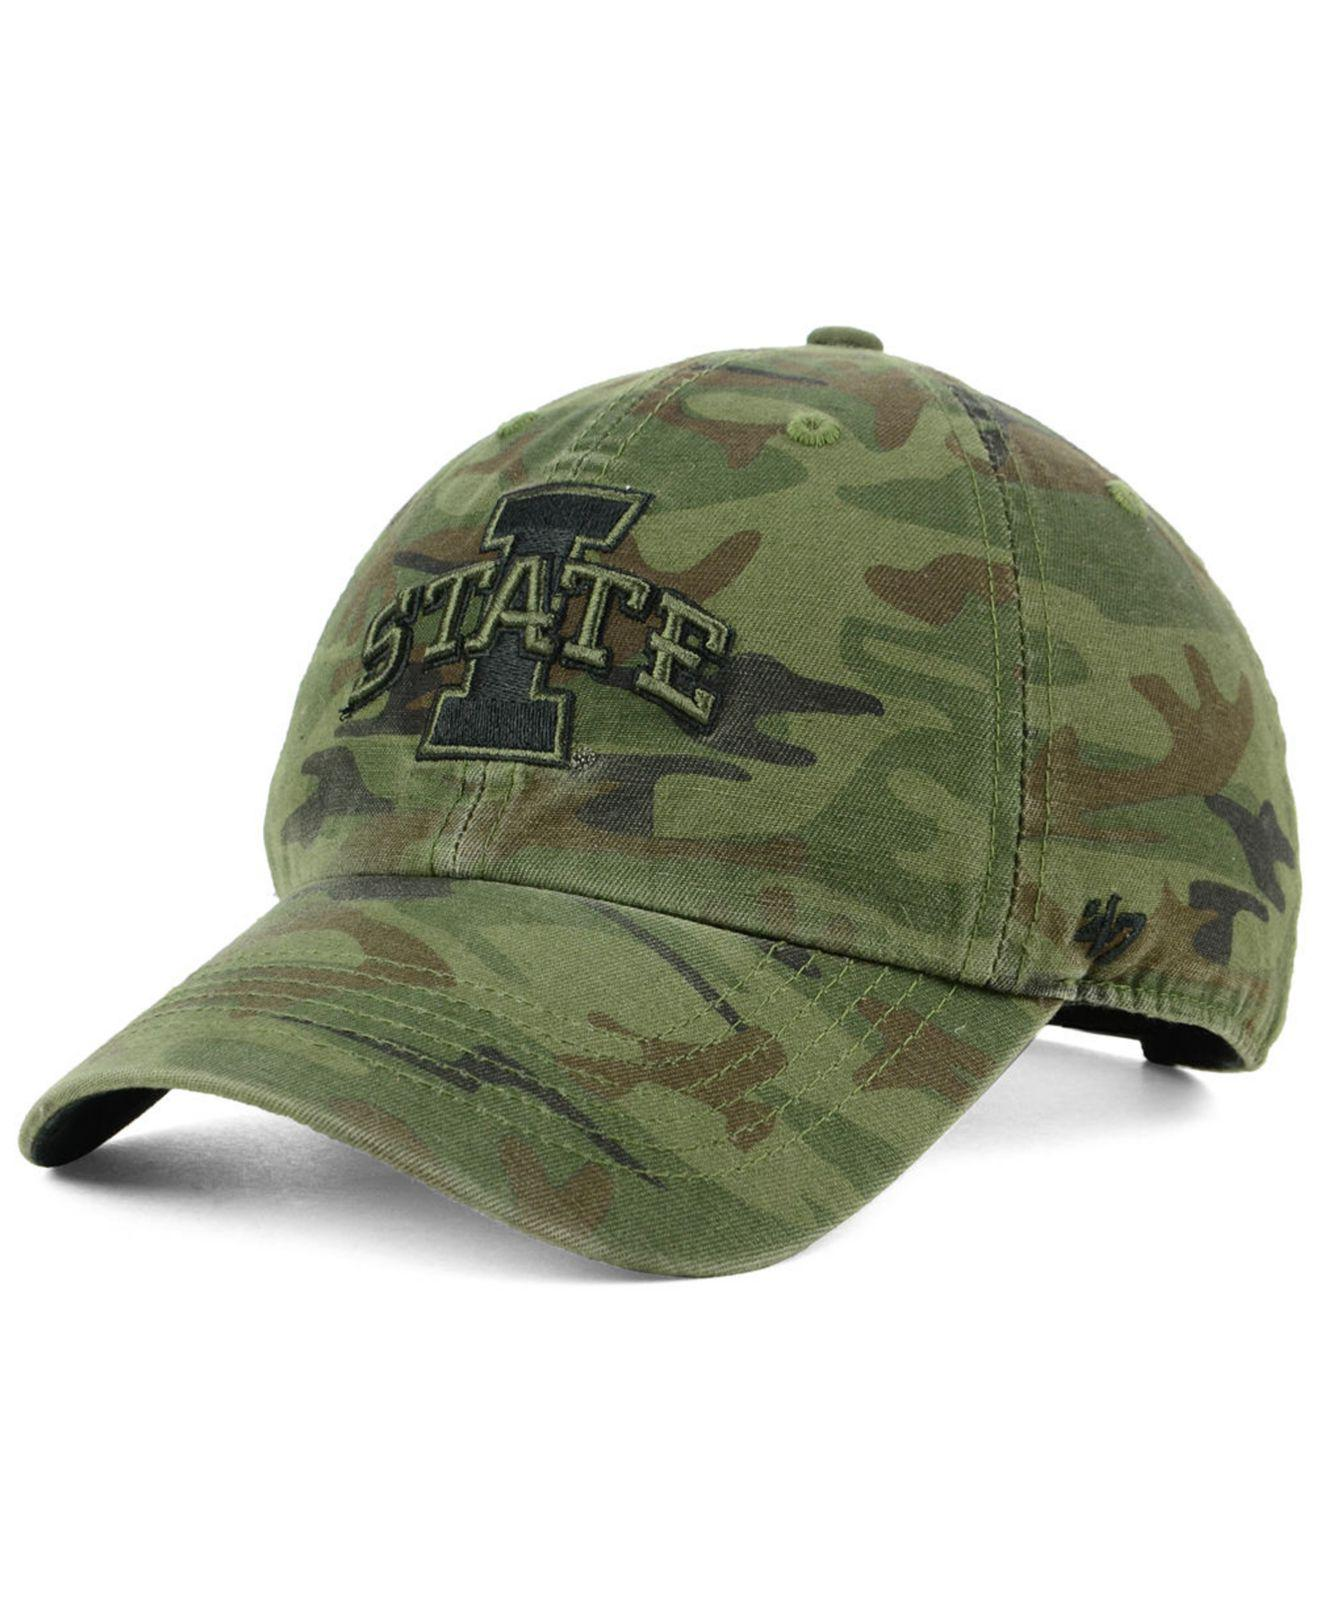 huge selection of e84e0 57a5e ... release date 47 brand. green iowa state cyclones regiment clean up  strapback cap 5fef3 91623